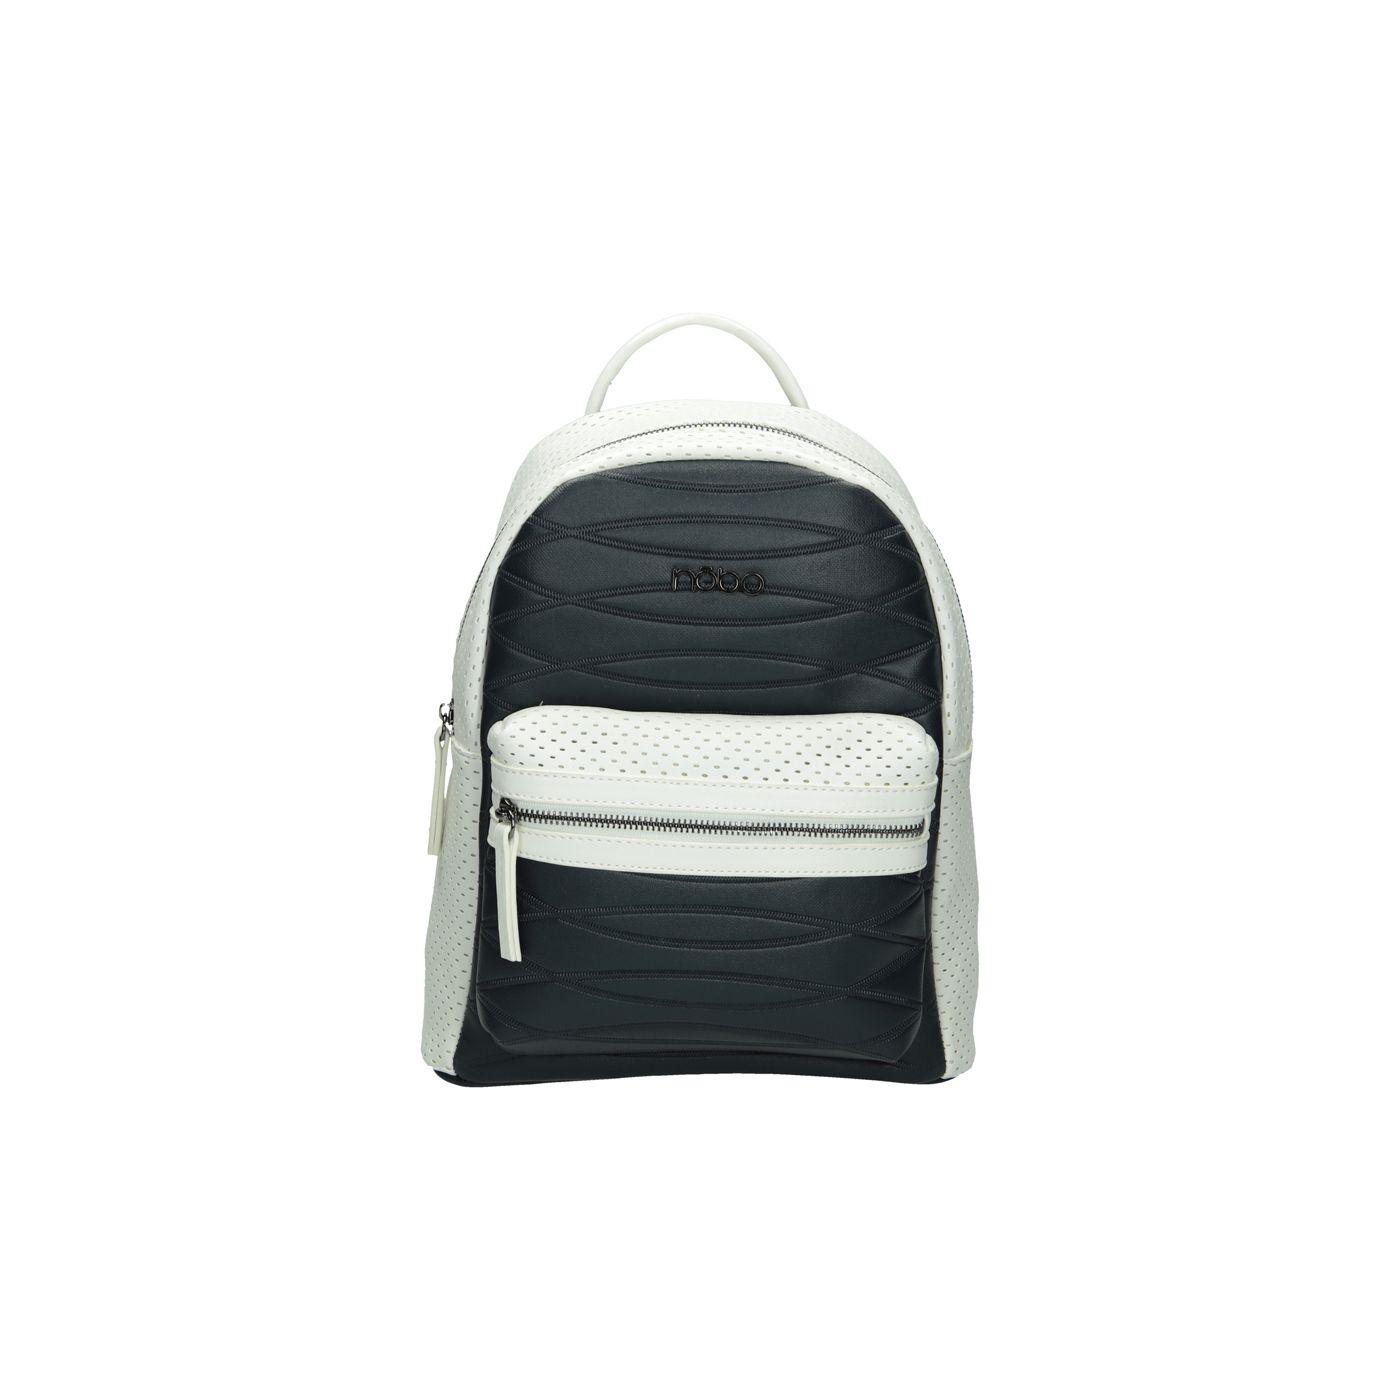 Nobo Woman's Backpack Nbag-G1300-C000